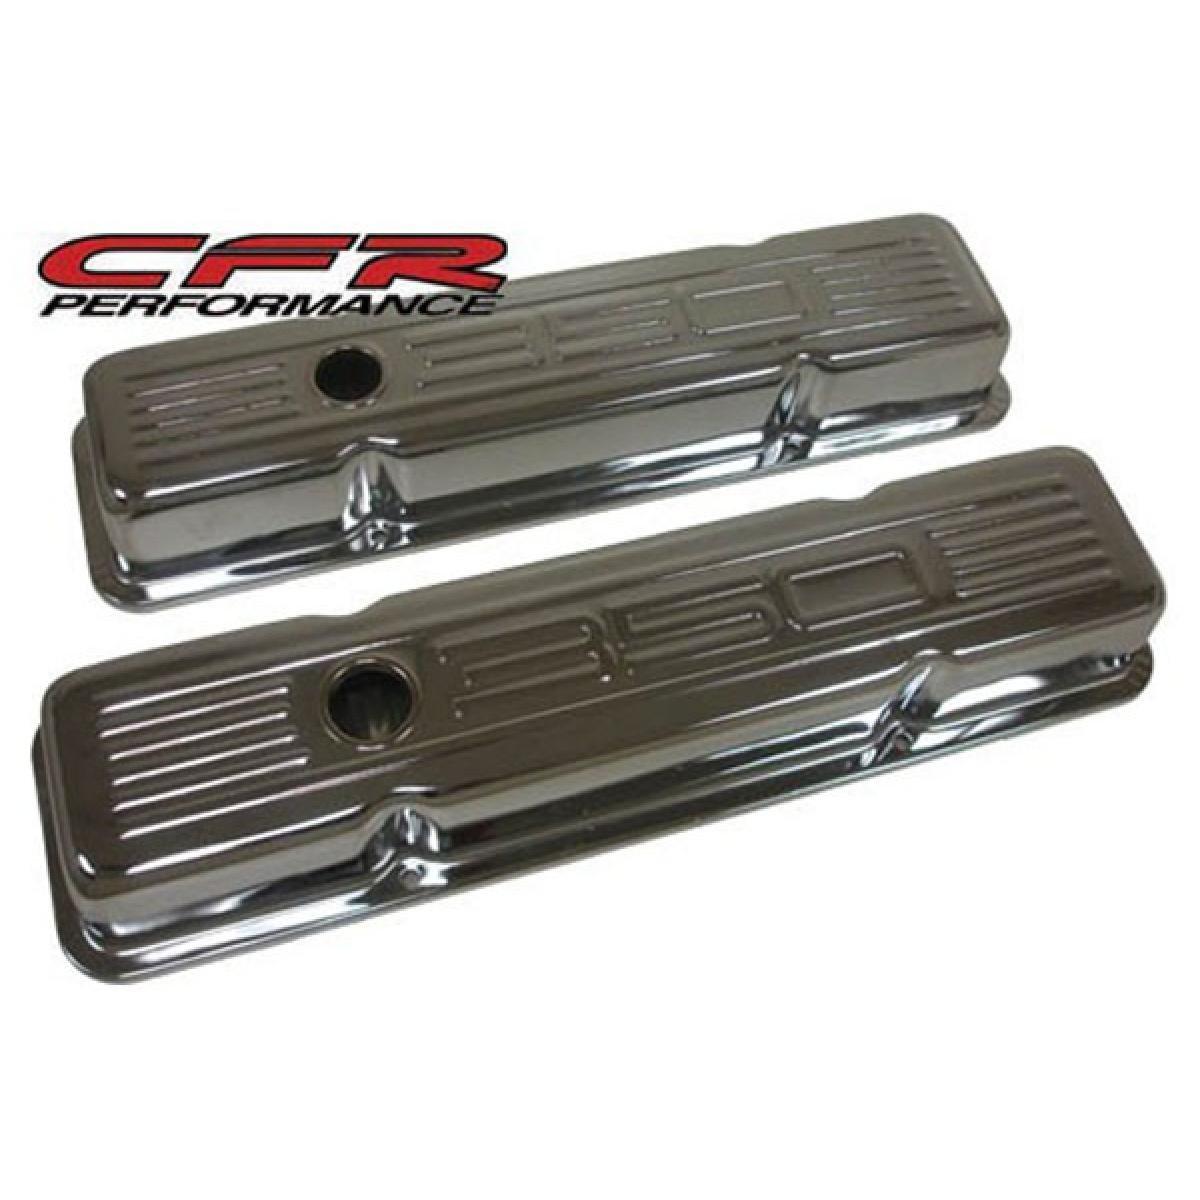 1958-86 Chevy Small Block 350 Short Steel Valve Covers - Chrome w/ 350 Logo CFR Performance HZ-9842